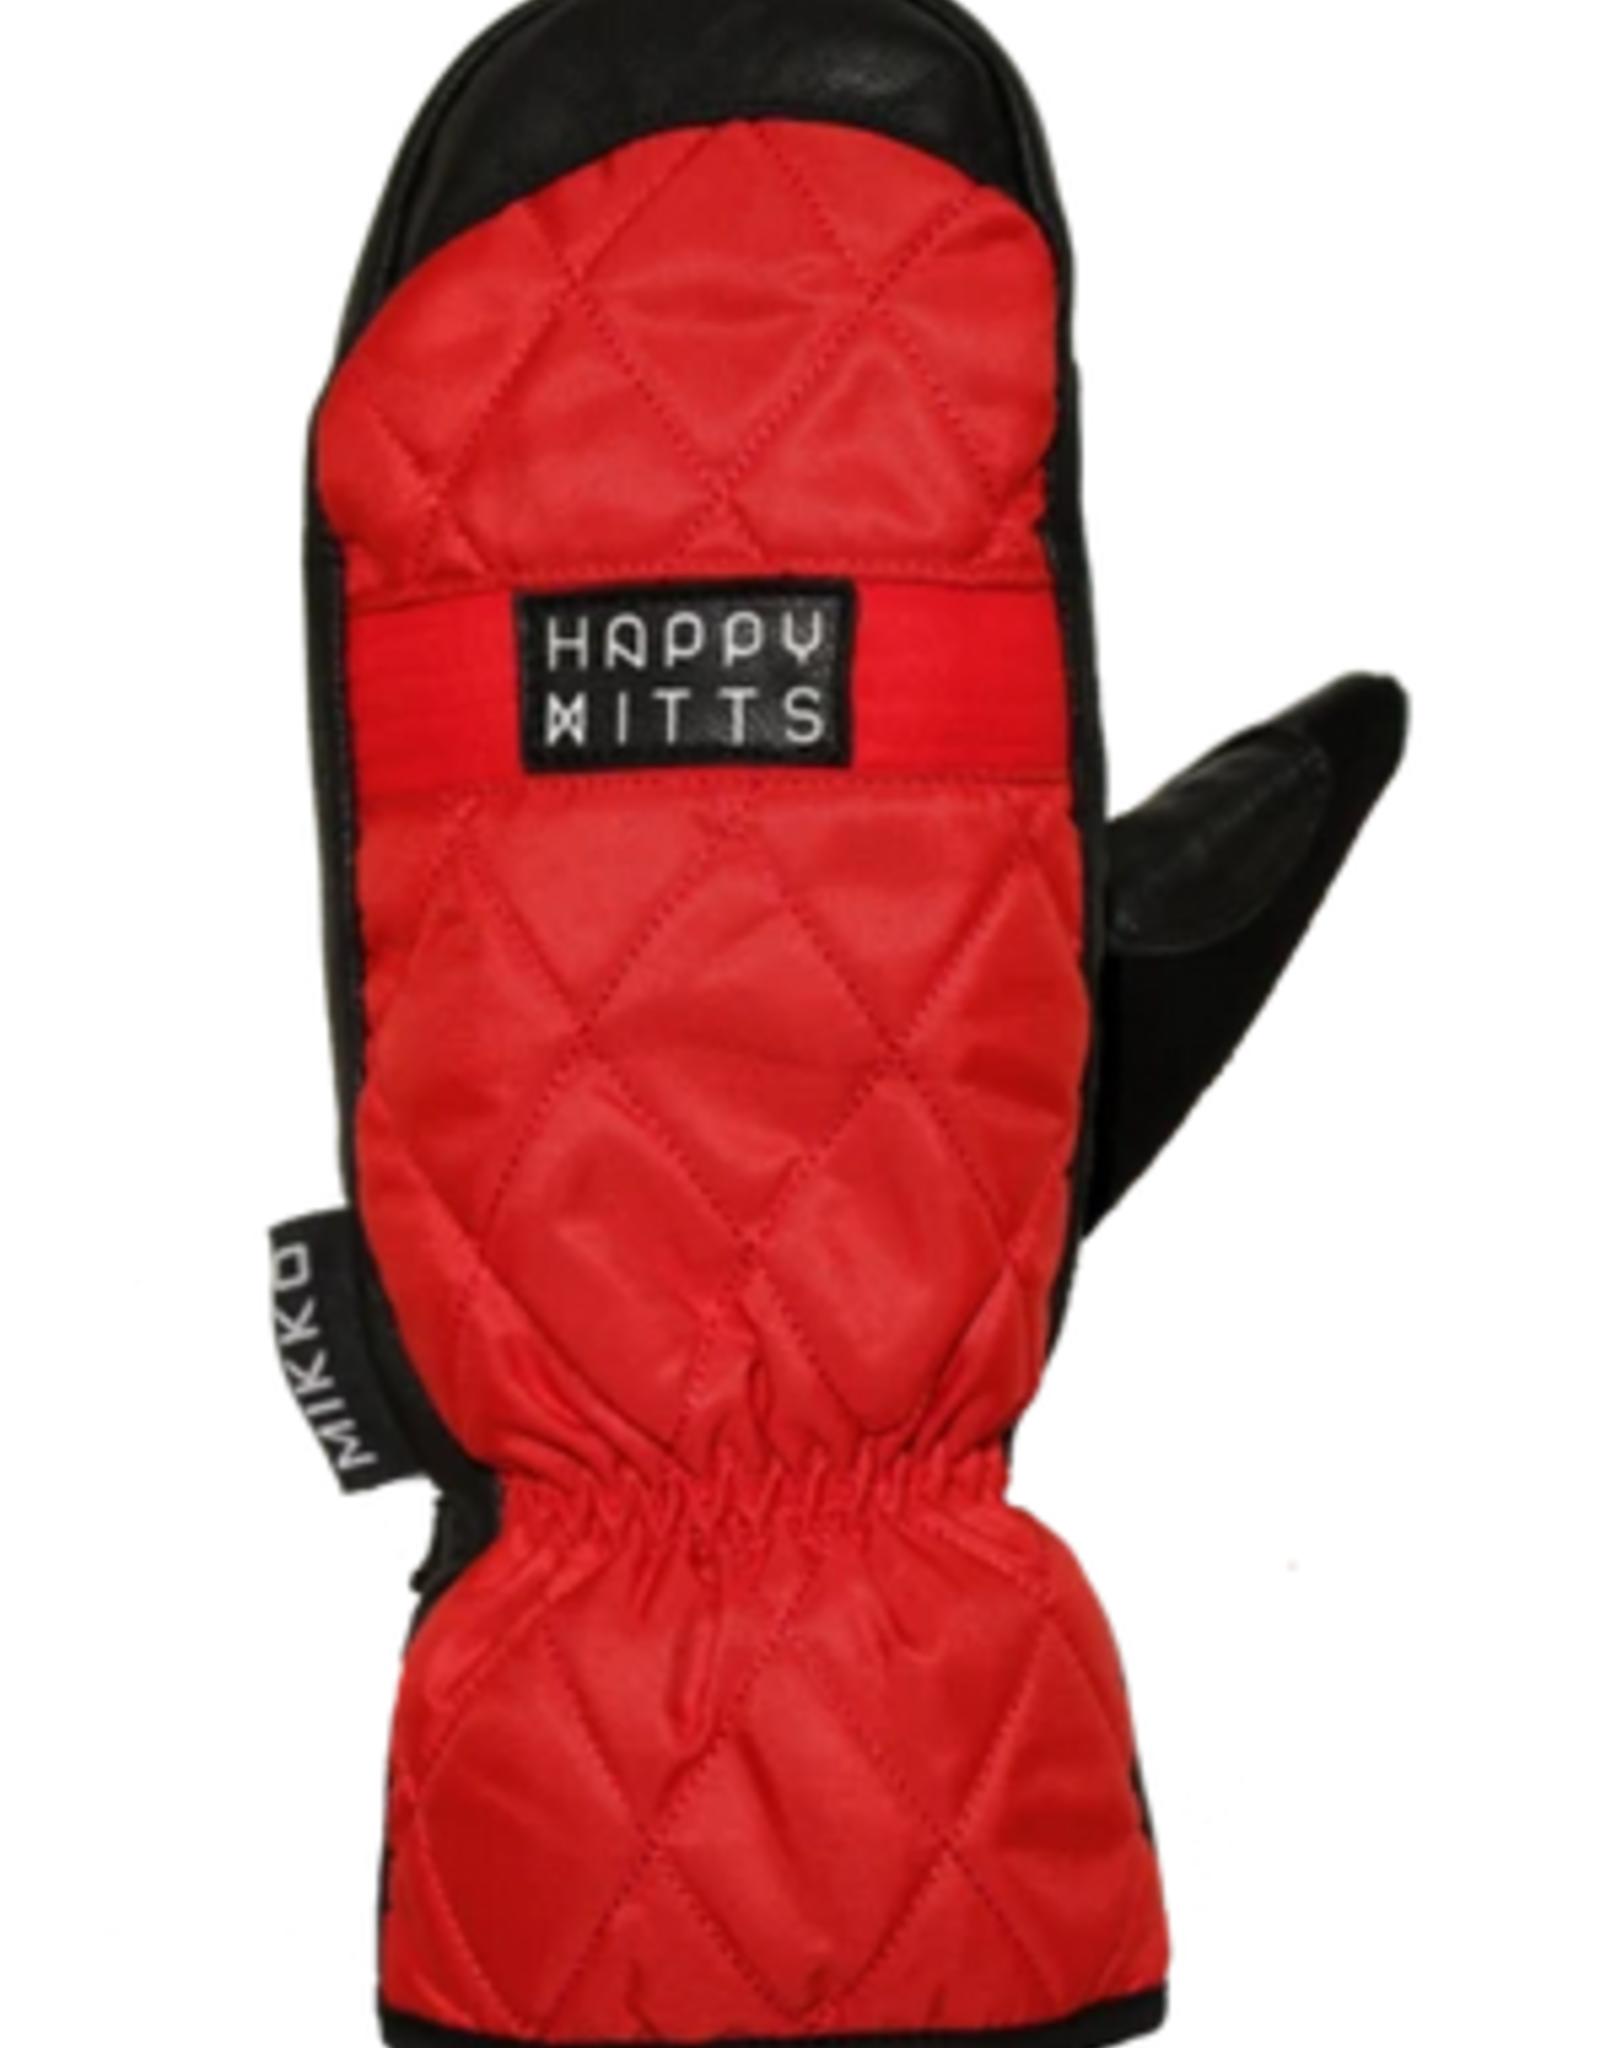 HAPPY MITTS HAPPY MITTS PUFFA MIKKA REHNBERG PRO MITT RED